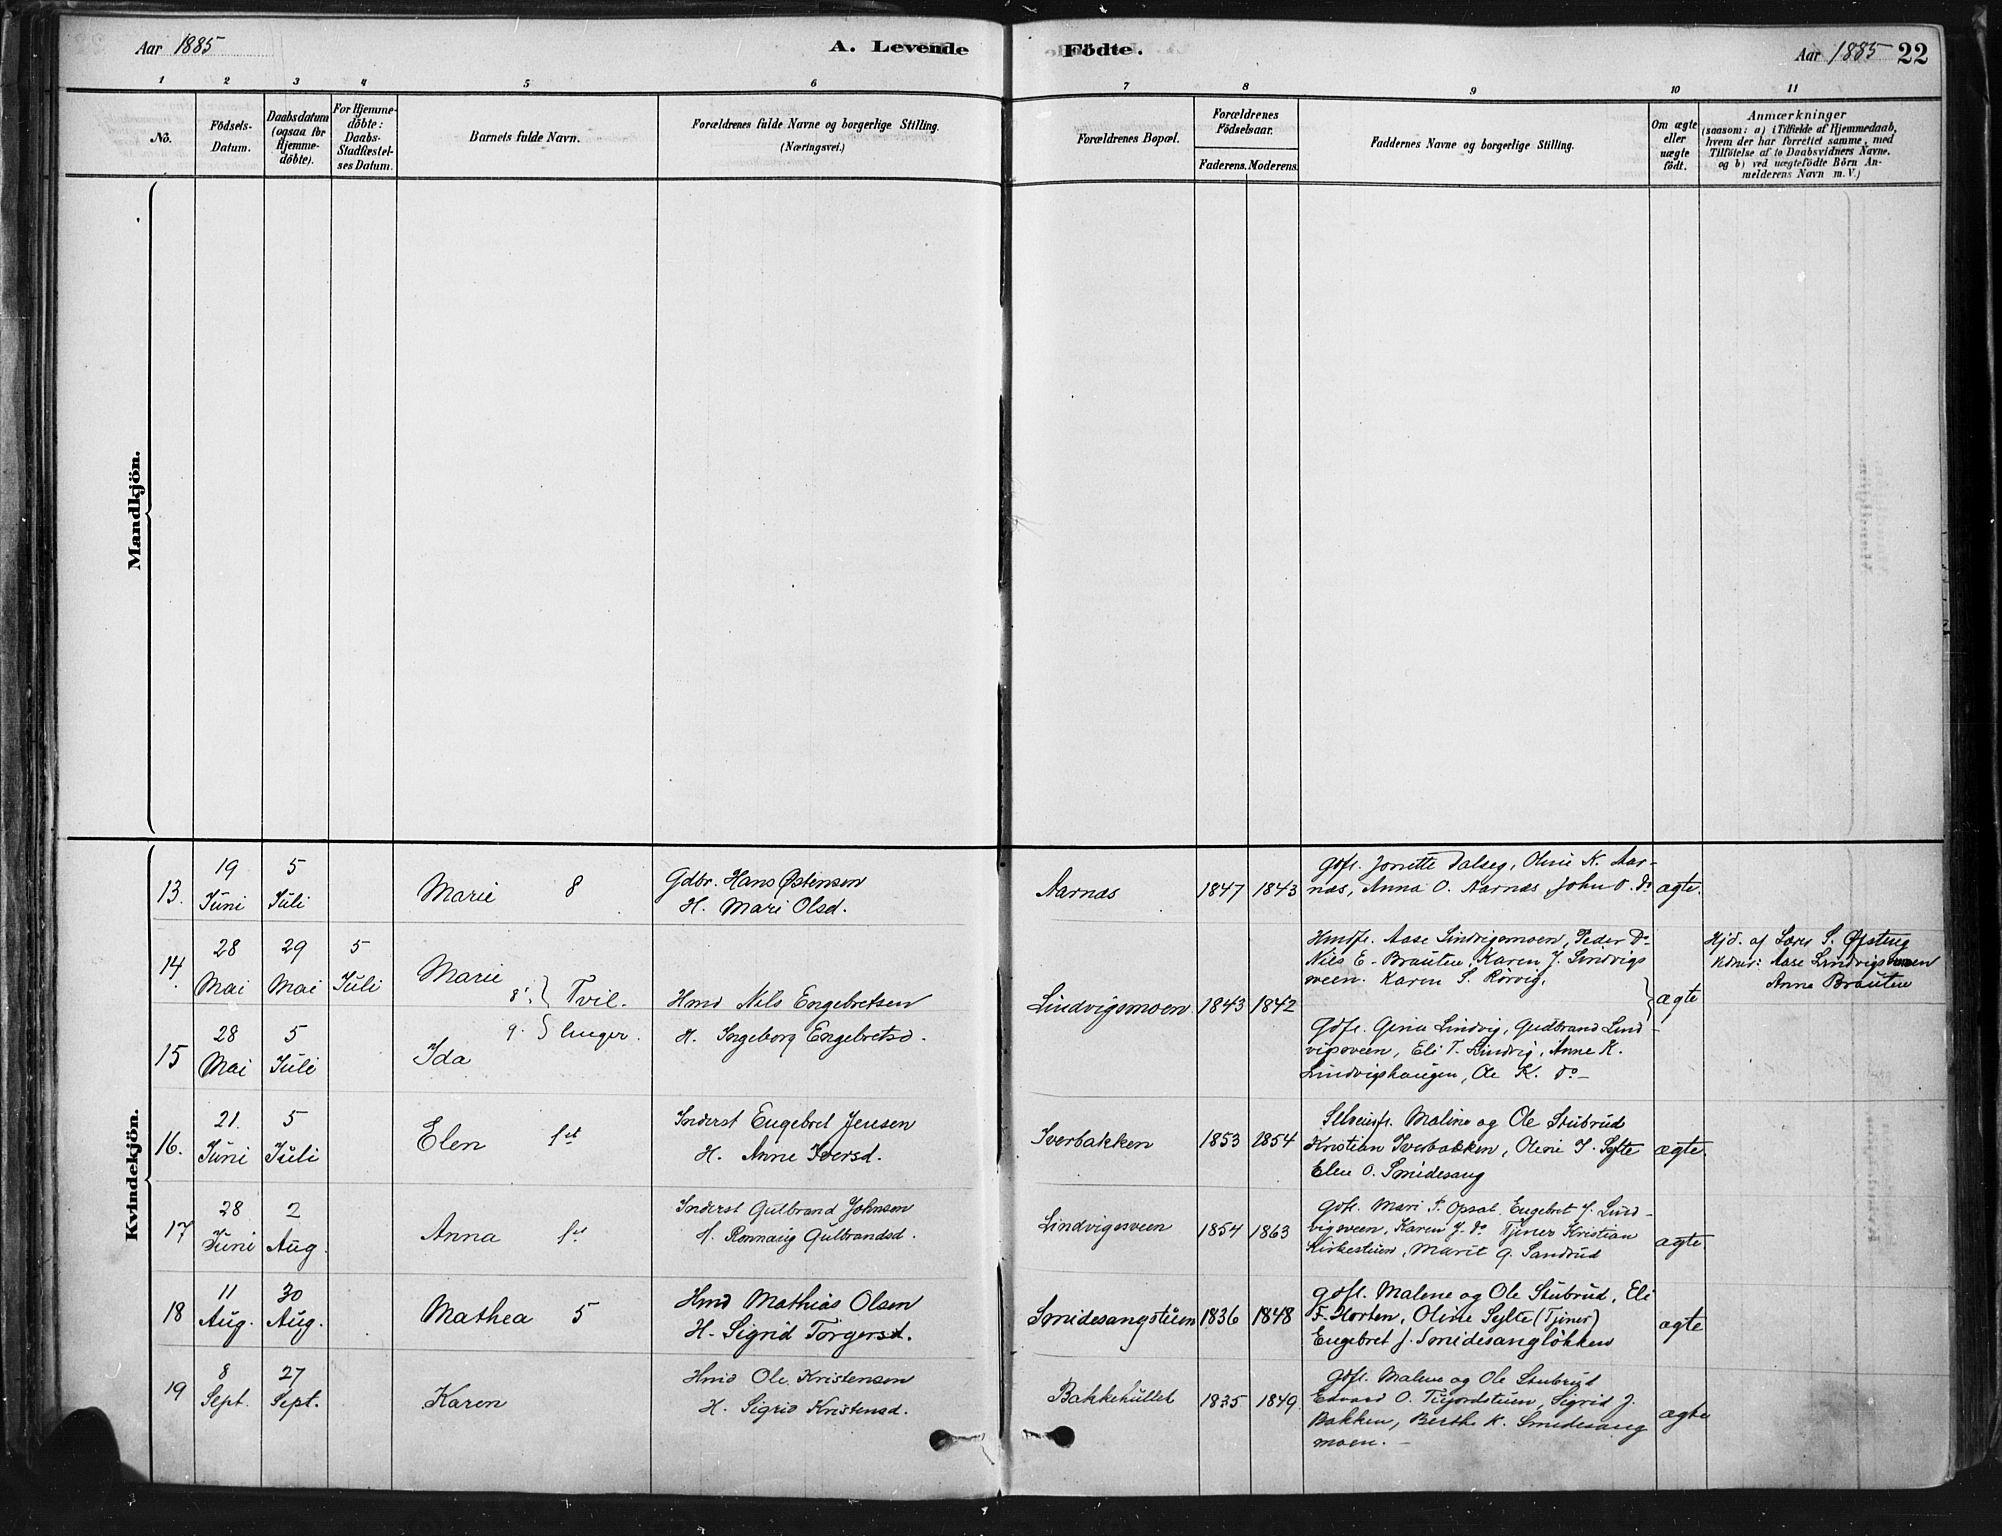 SAH, Ringebu prestekontor, Ministerialbok nr. 9, 1878-1898, s. 22